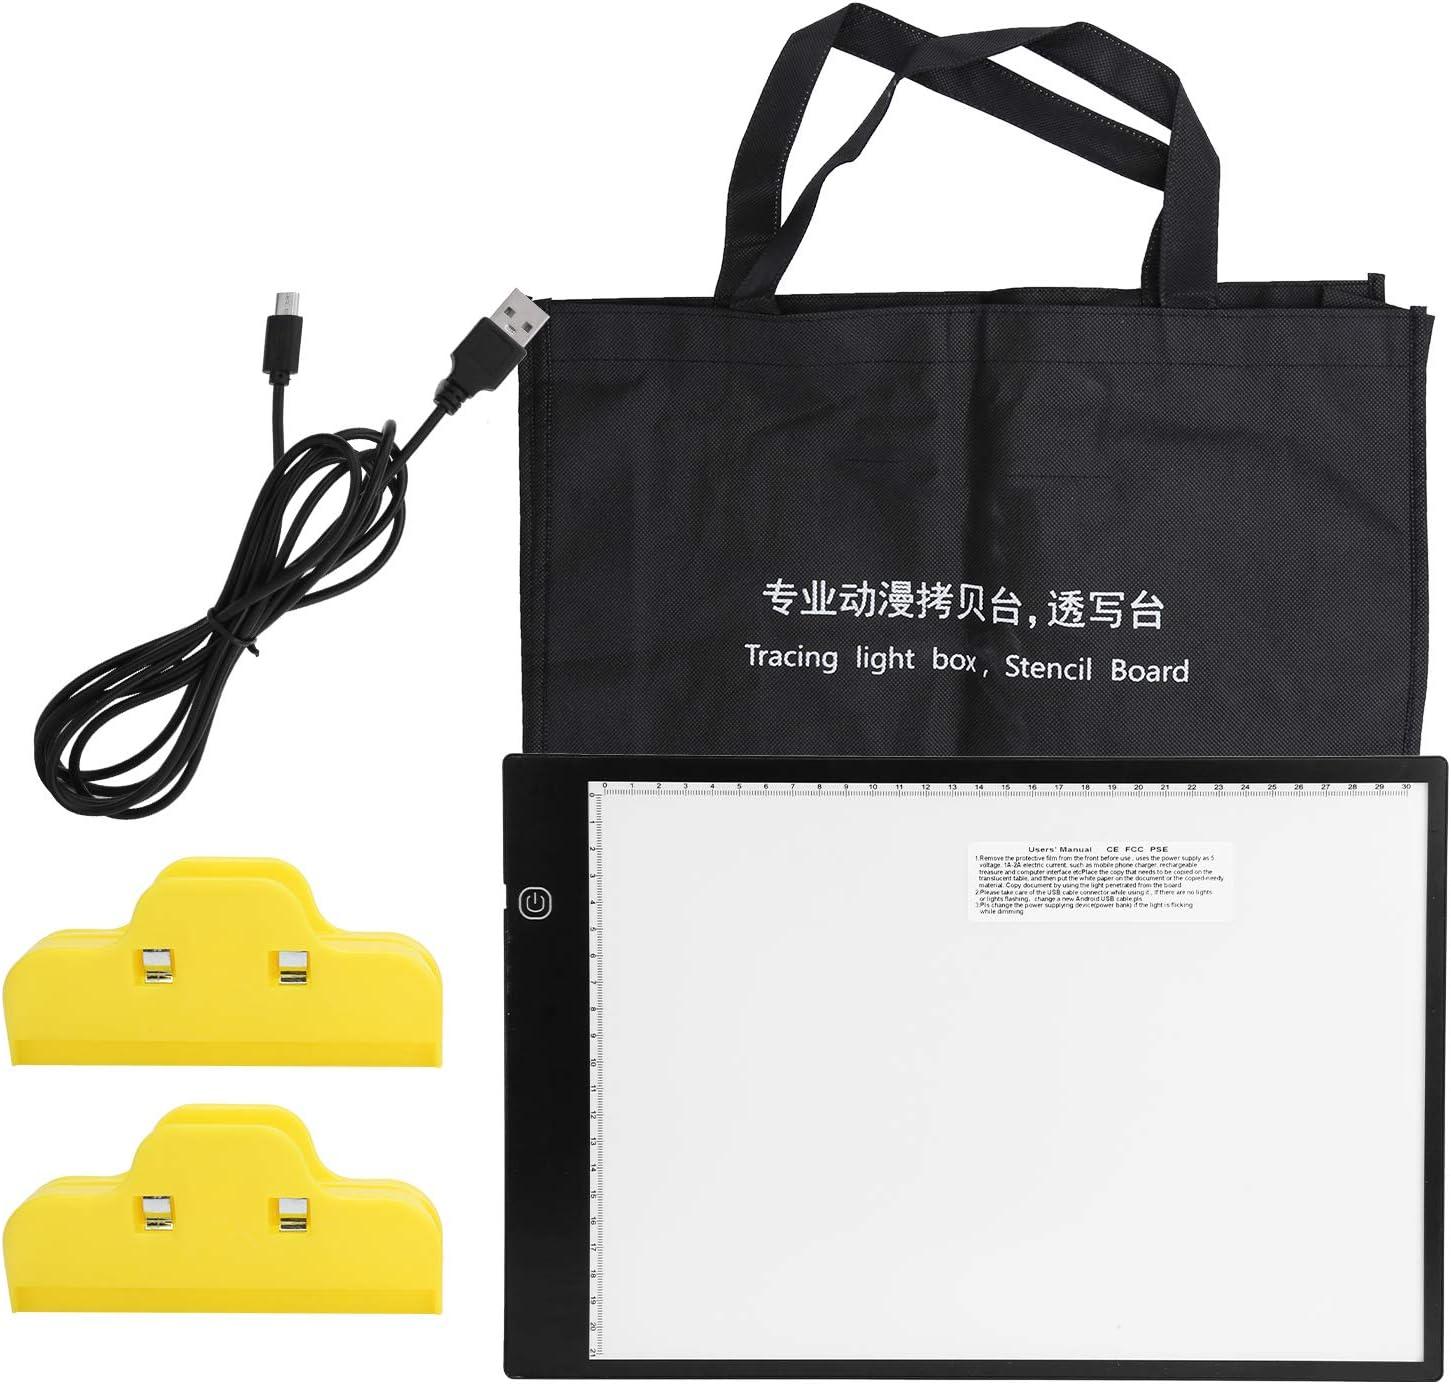 Superlatite LED Copy Board Light Box Tracing Portable A4B Finally resale start Dimmable A4